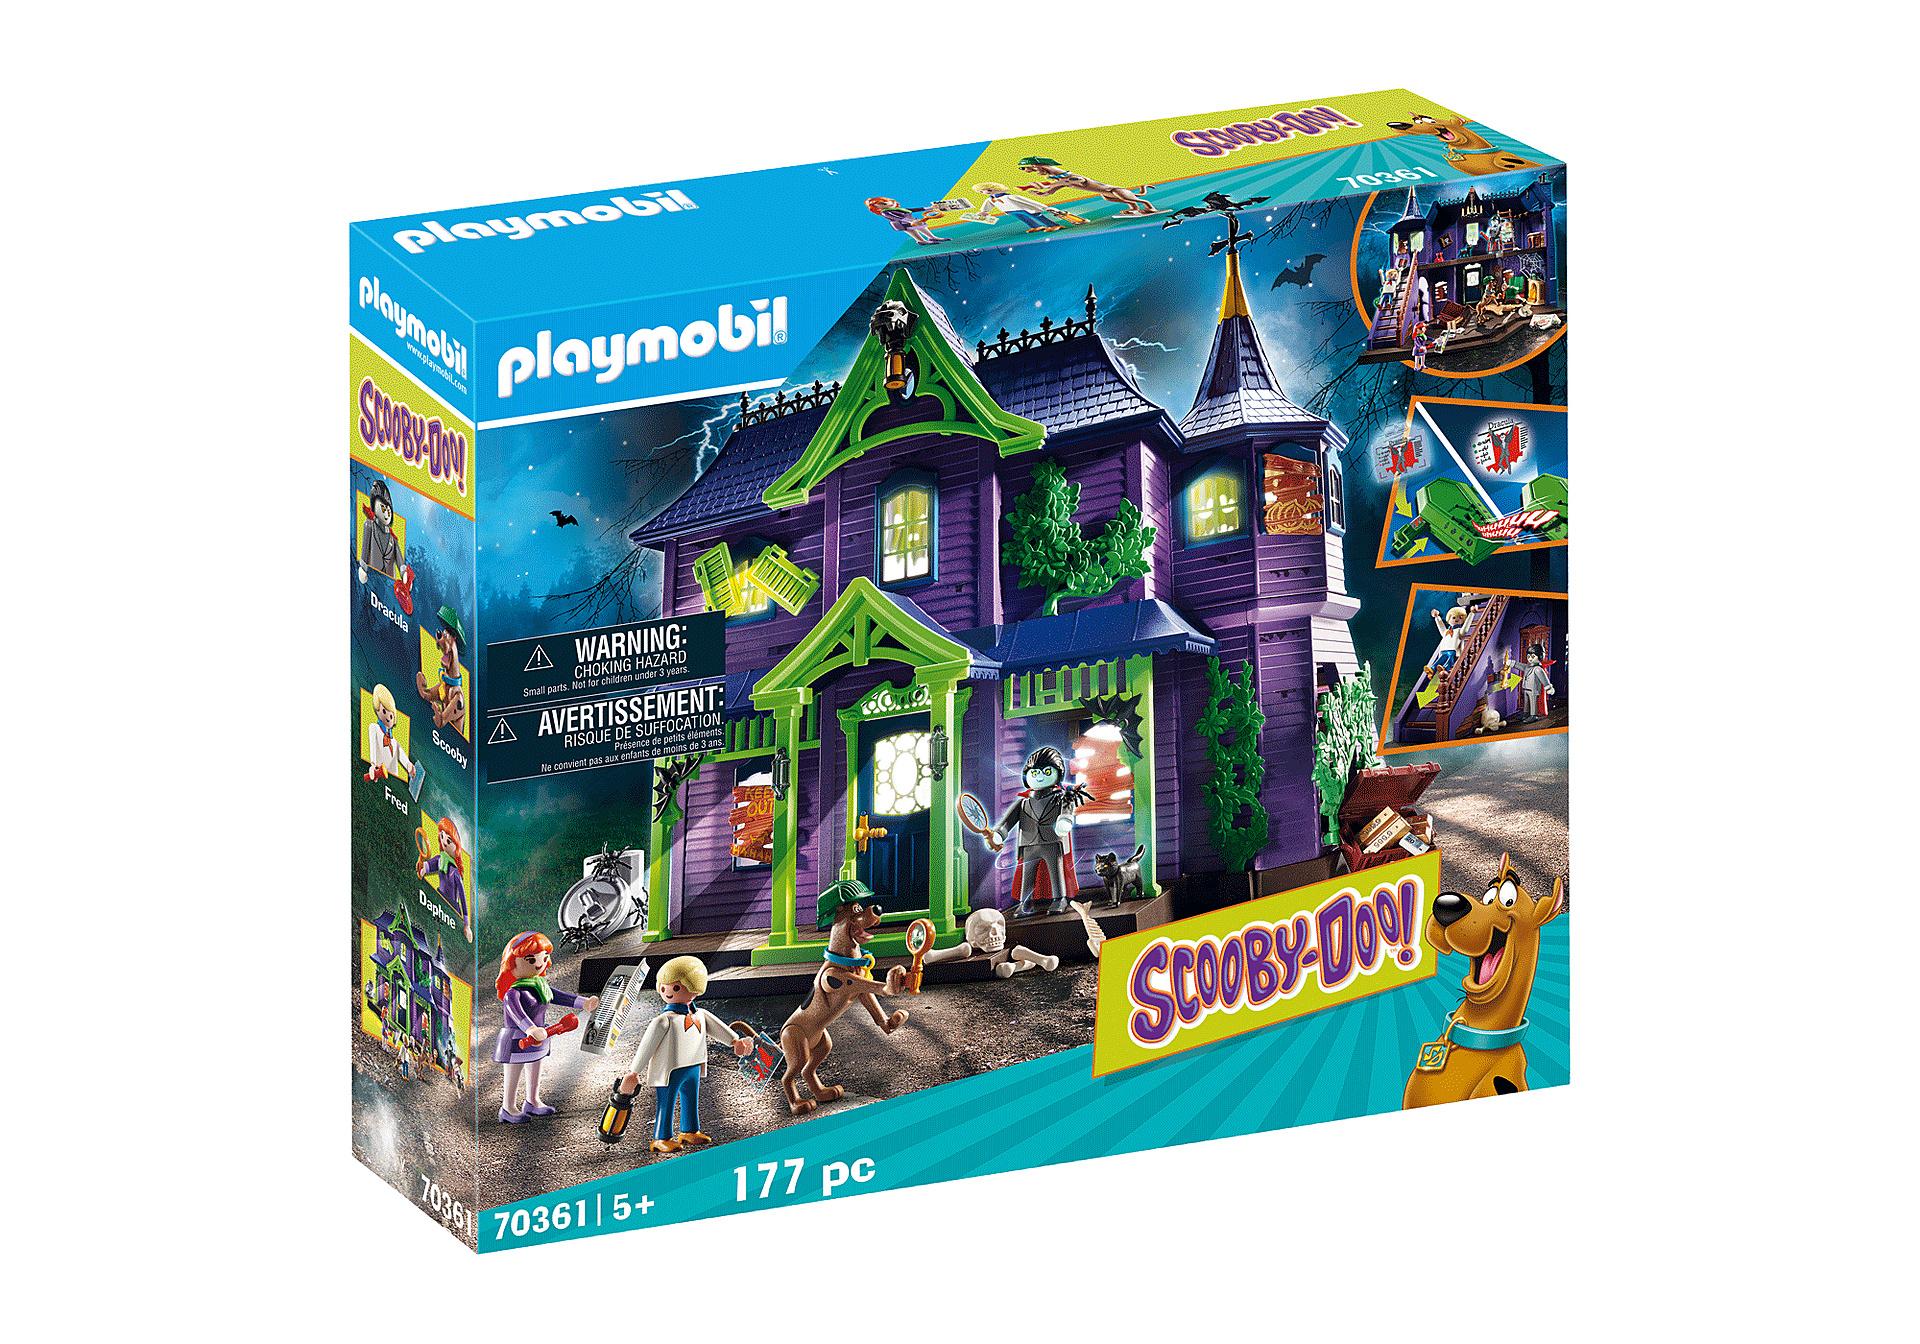 Real b ware : - wie neu- Playmobil Scooby Doo Abenteuer im Geisterhaus , erschienen Anfang 2020 ... mit vielen Figuren/Spielfunktionen